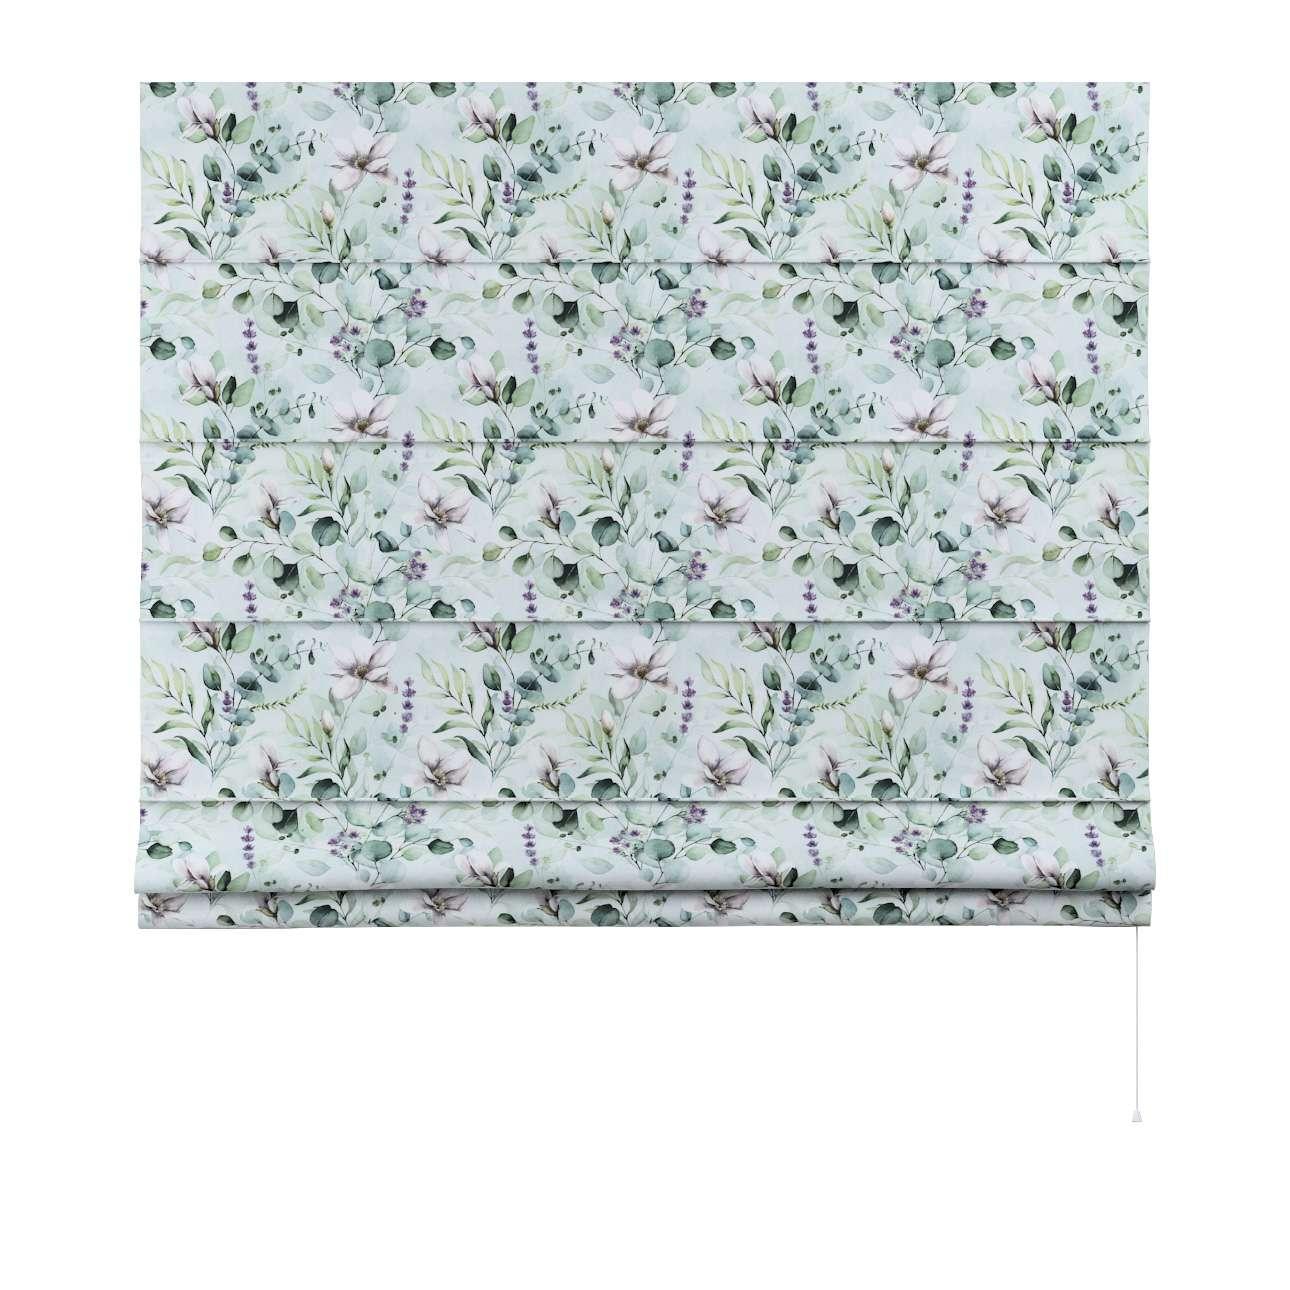 Rímska roleta Capri V kolekcii Flowers, tkanina: 143-66